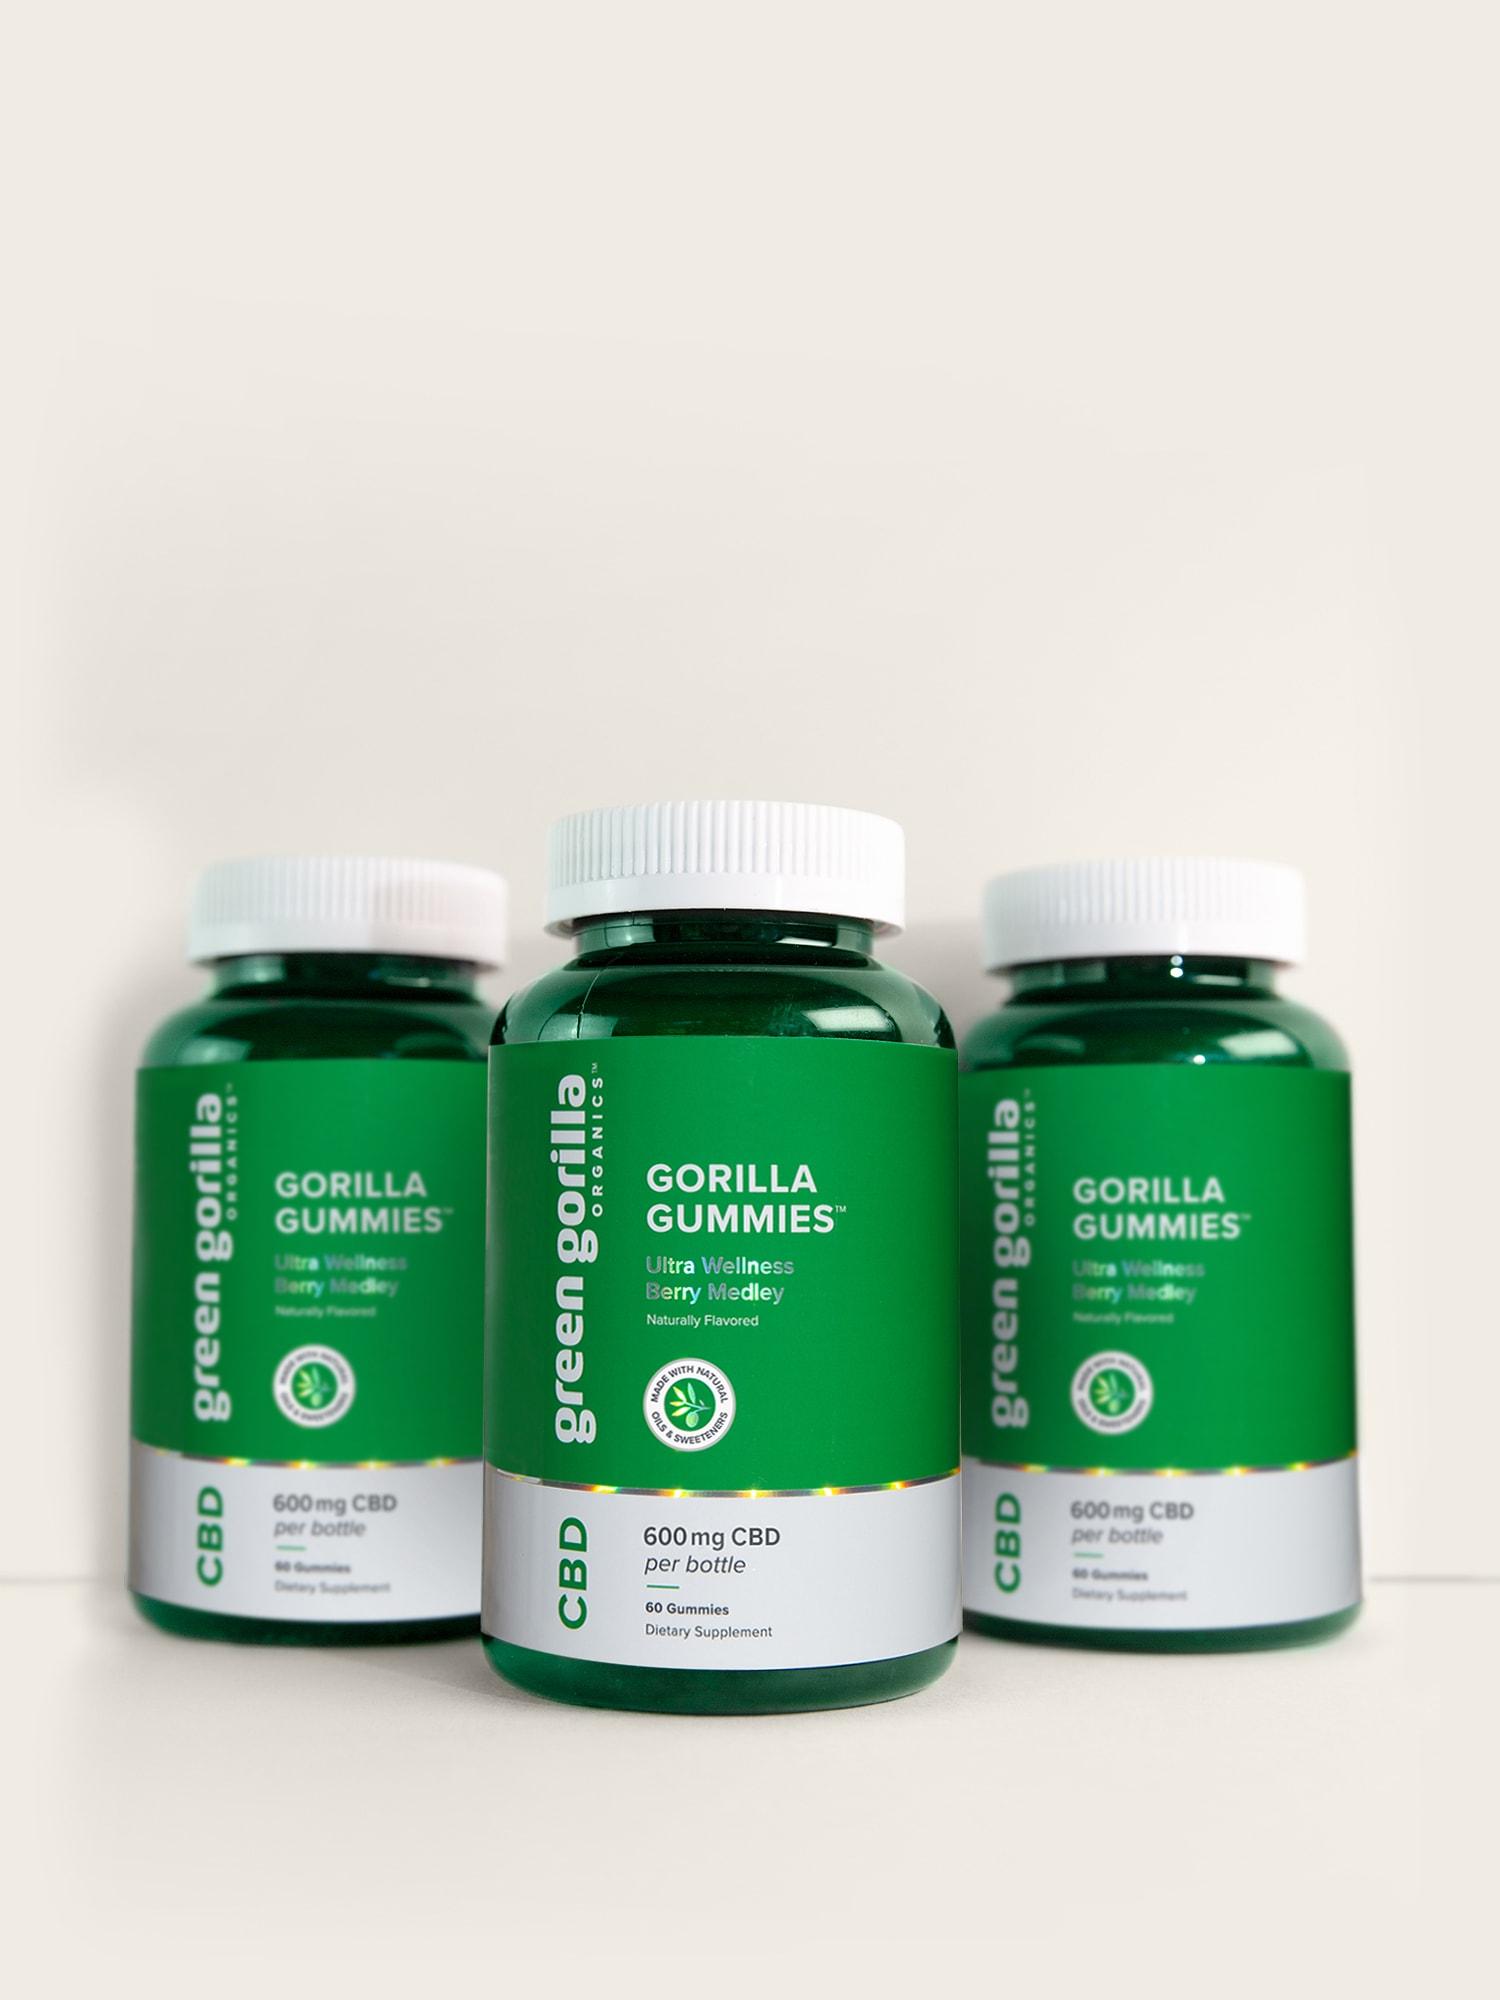 three bottles of Green Gorilla™ hemp CBD gummies